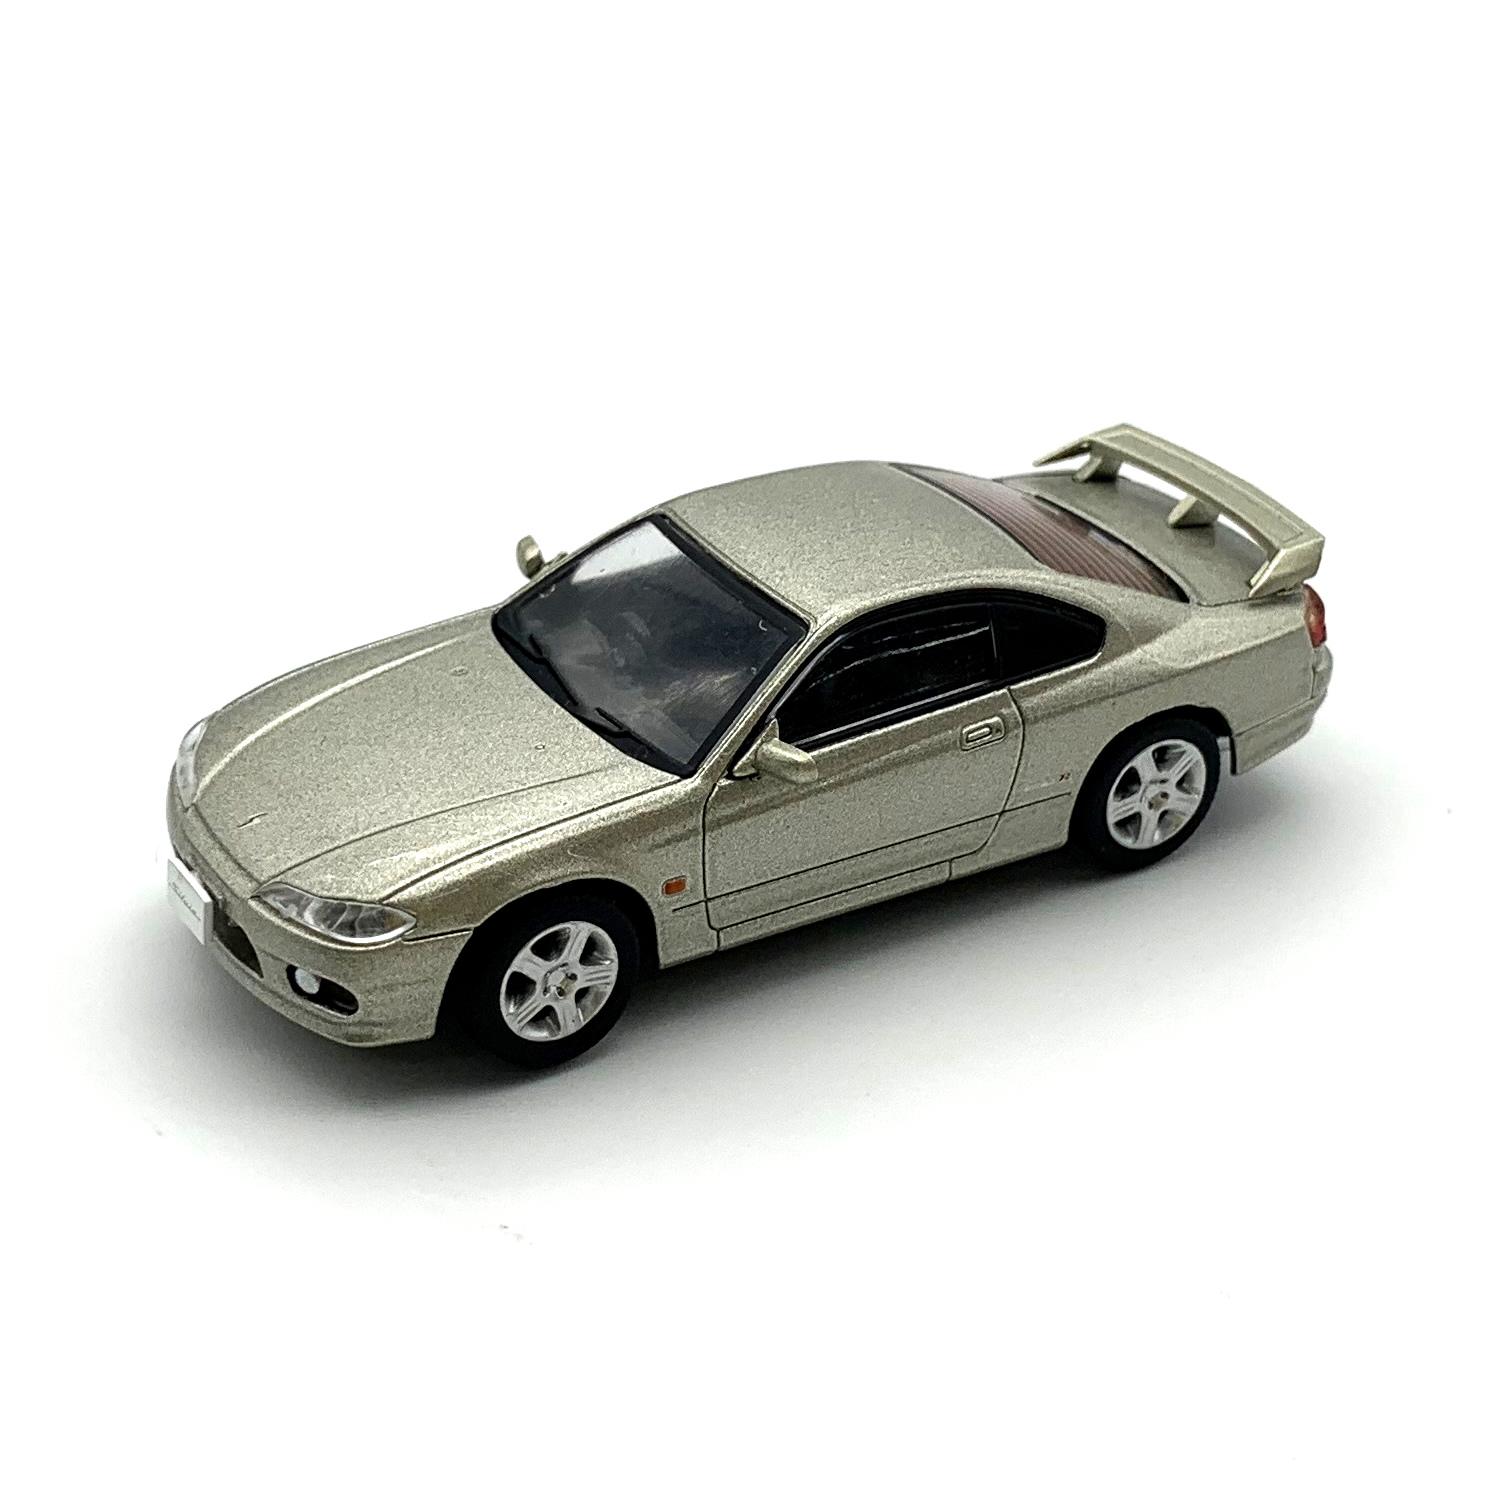 DIECAST MASTERS 日産 シルビア S15 シルバー RHD